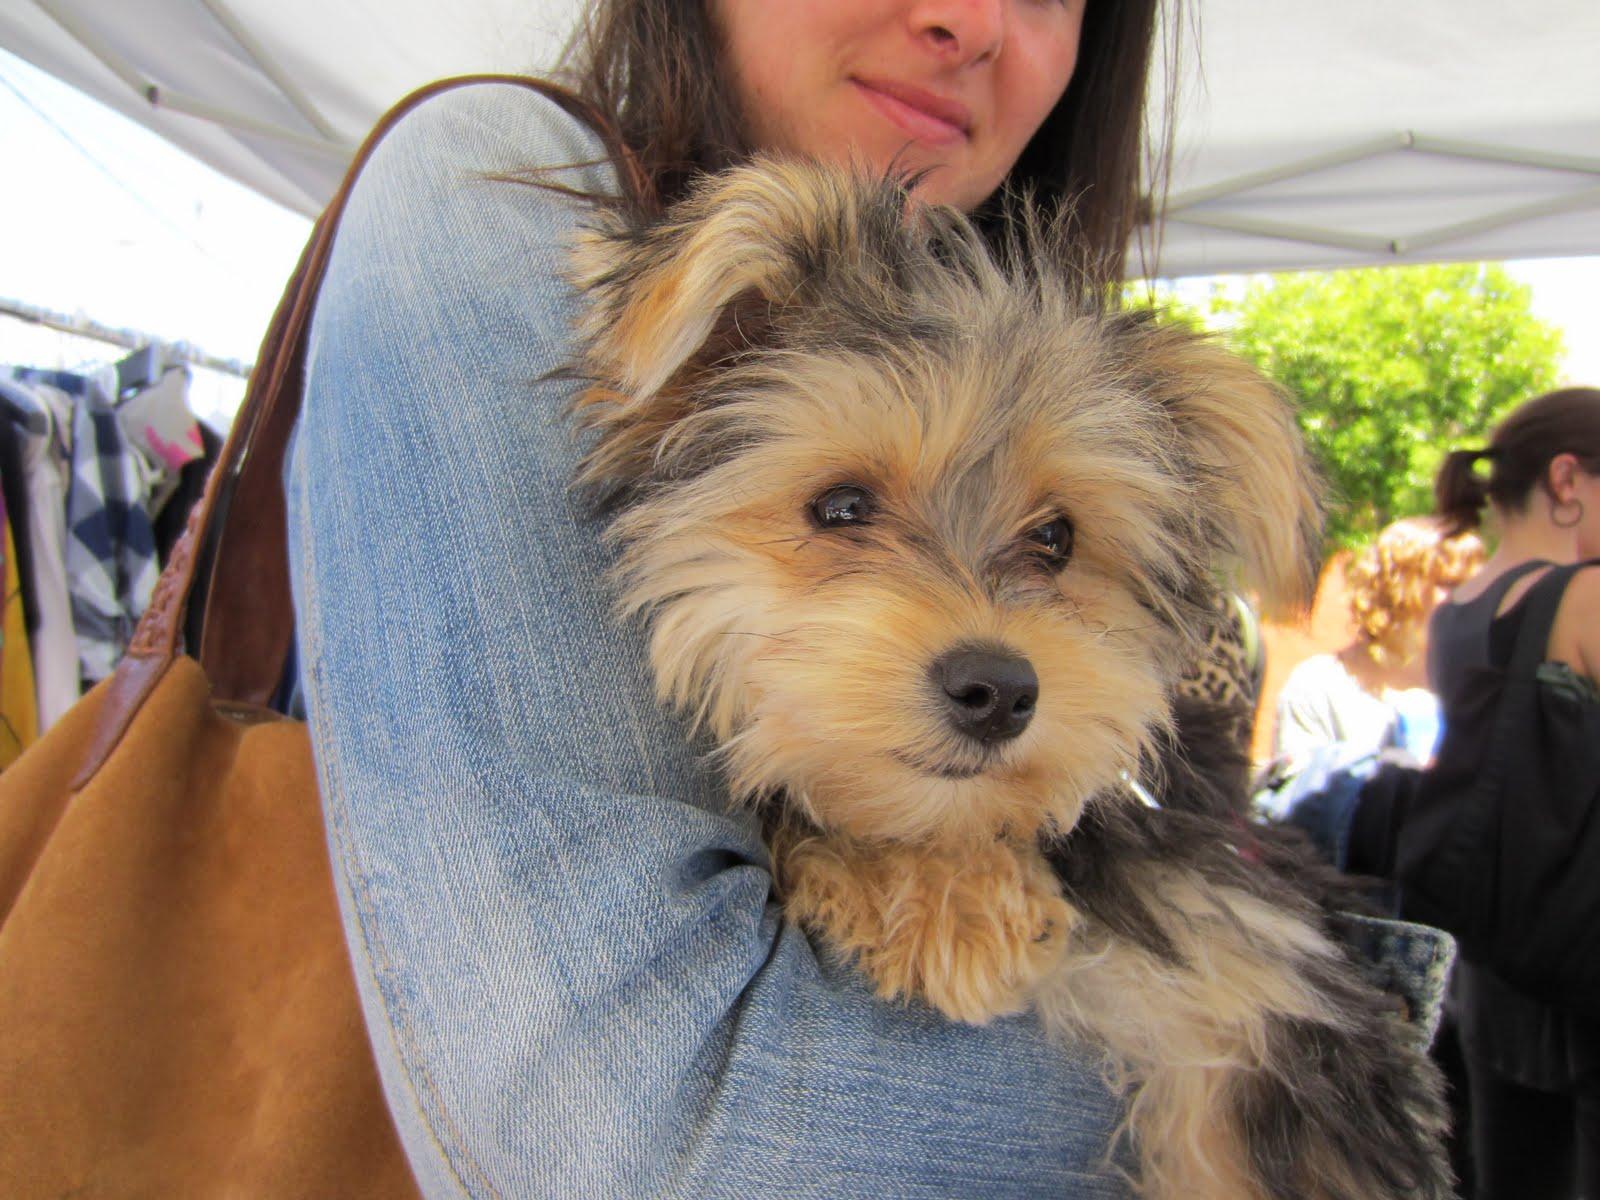 Author - Admin Date - 16:00 maltese mix Mixed Dog Breeds yorkie